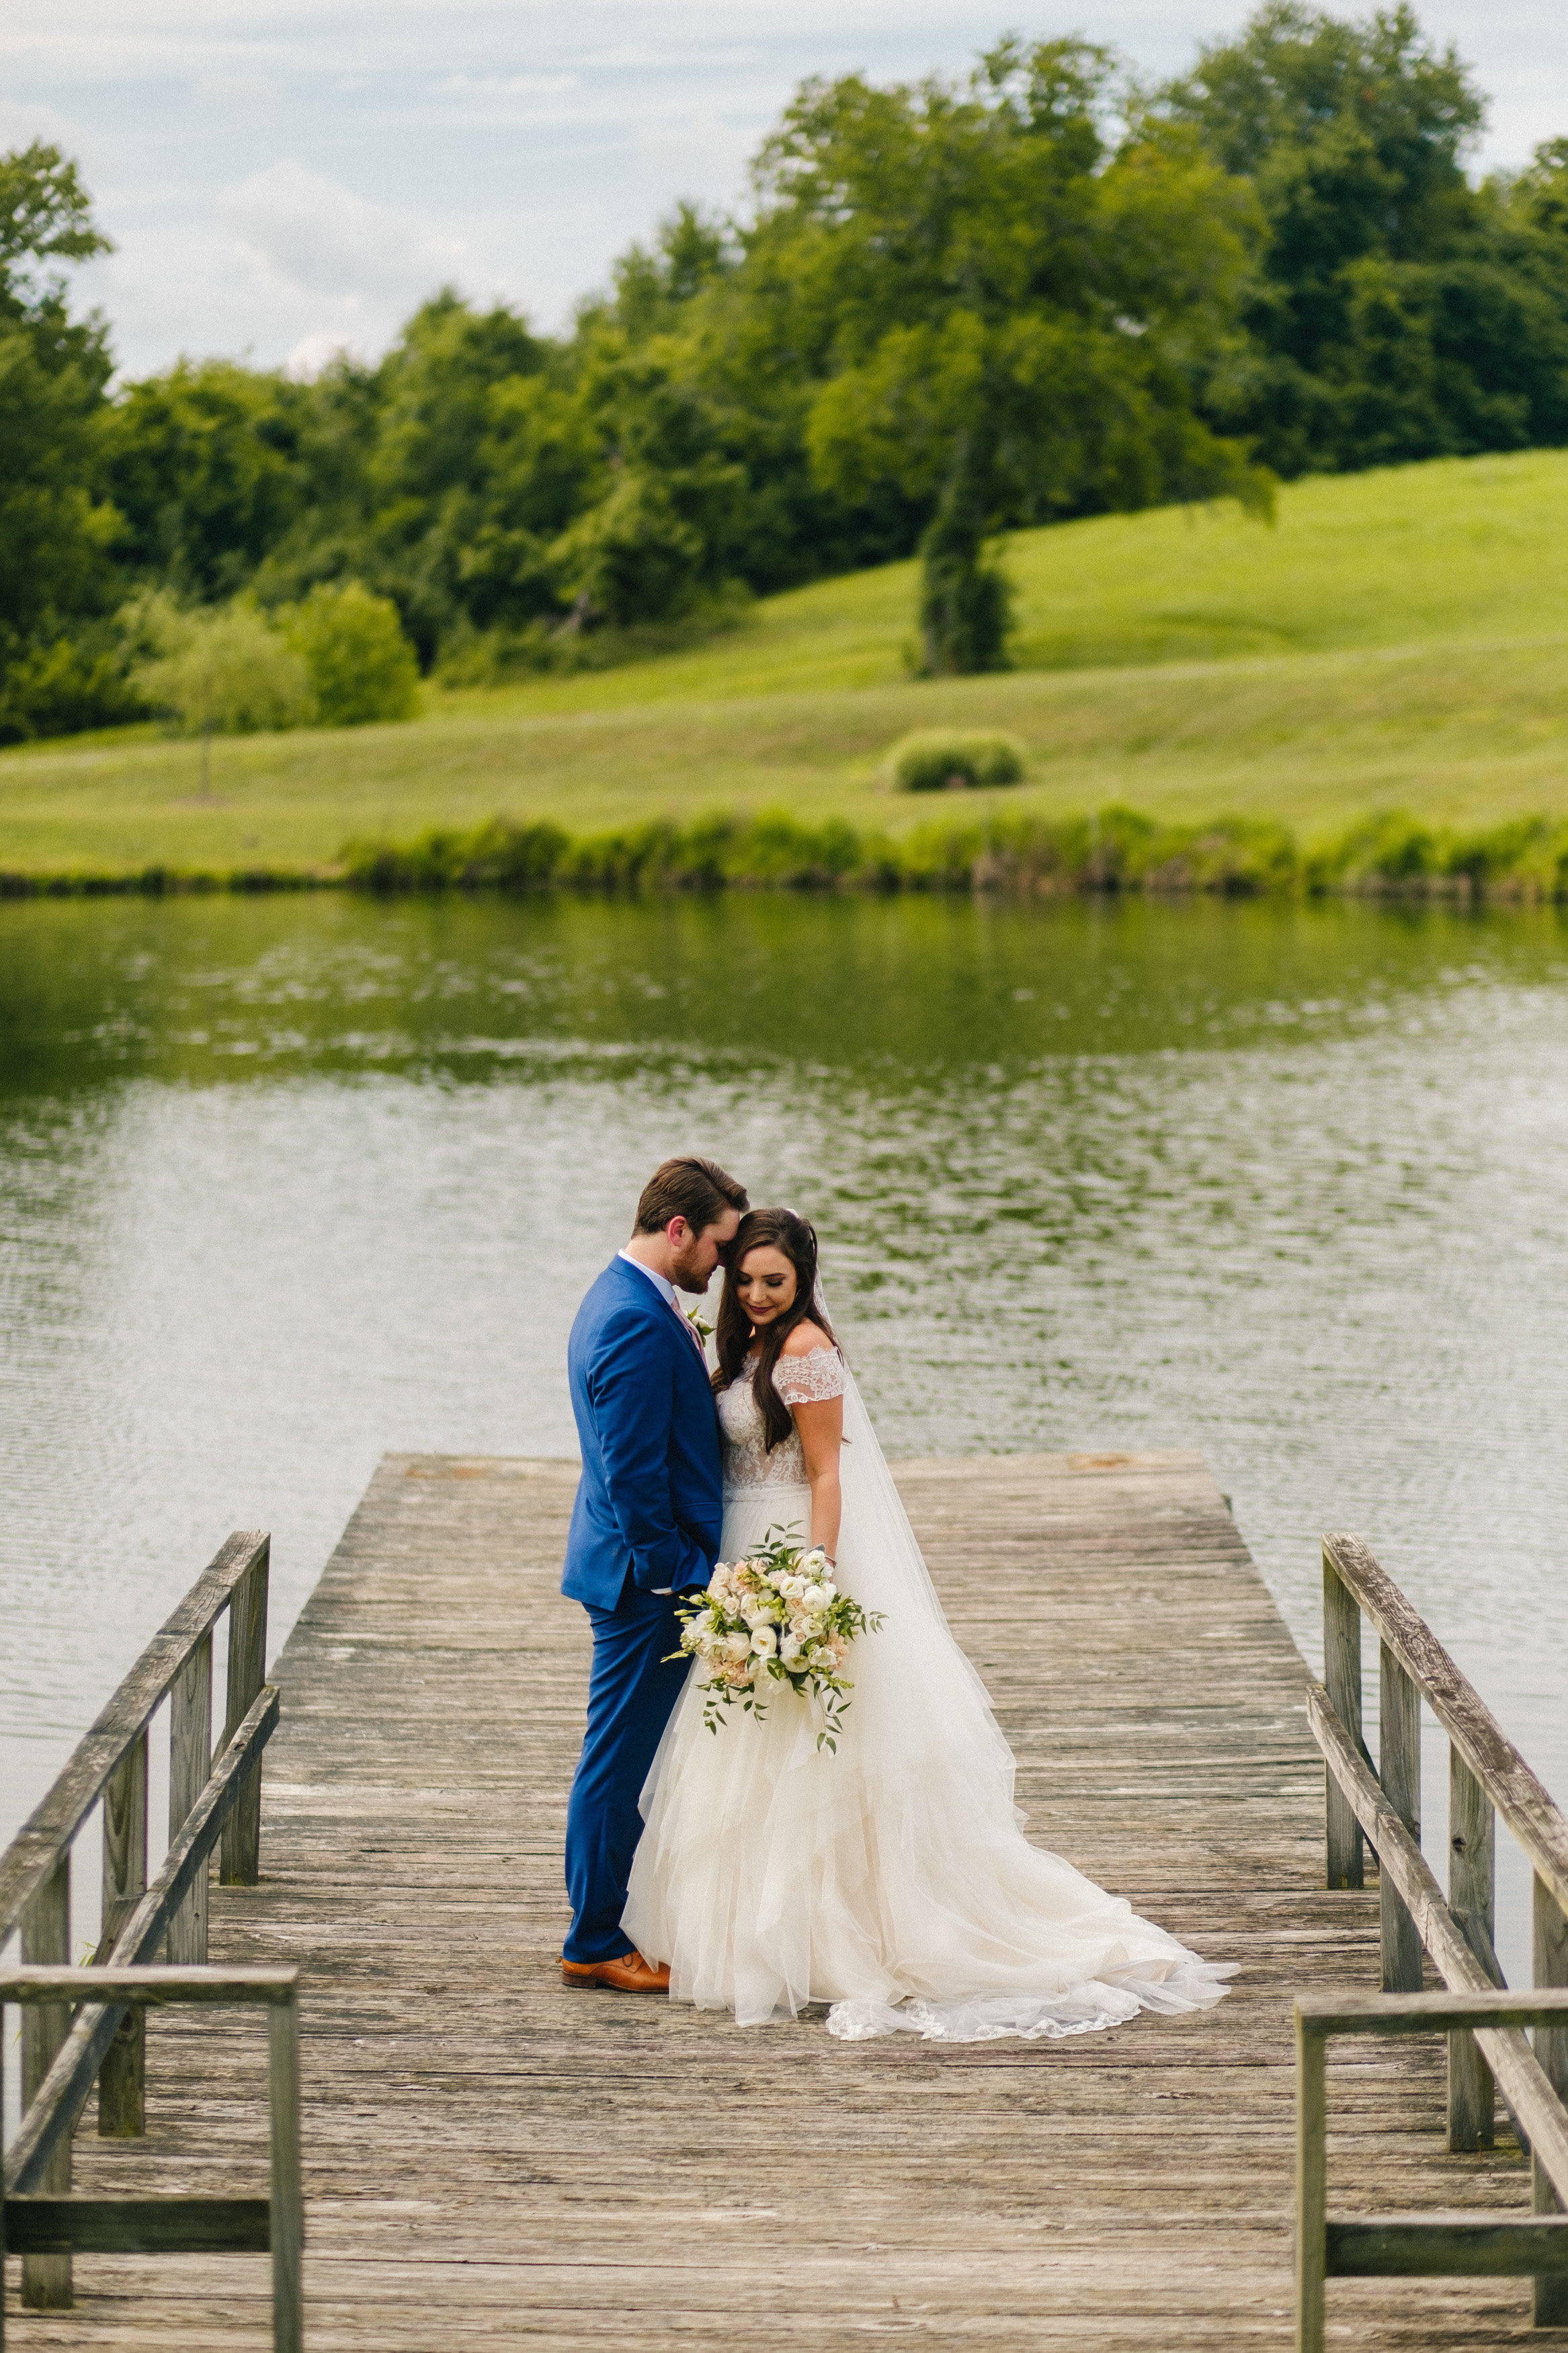 Nashville_Wedding_Photography_Mint_Springs_42.jpg